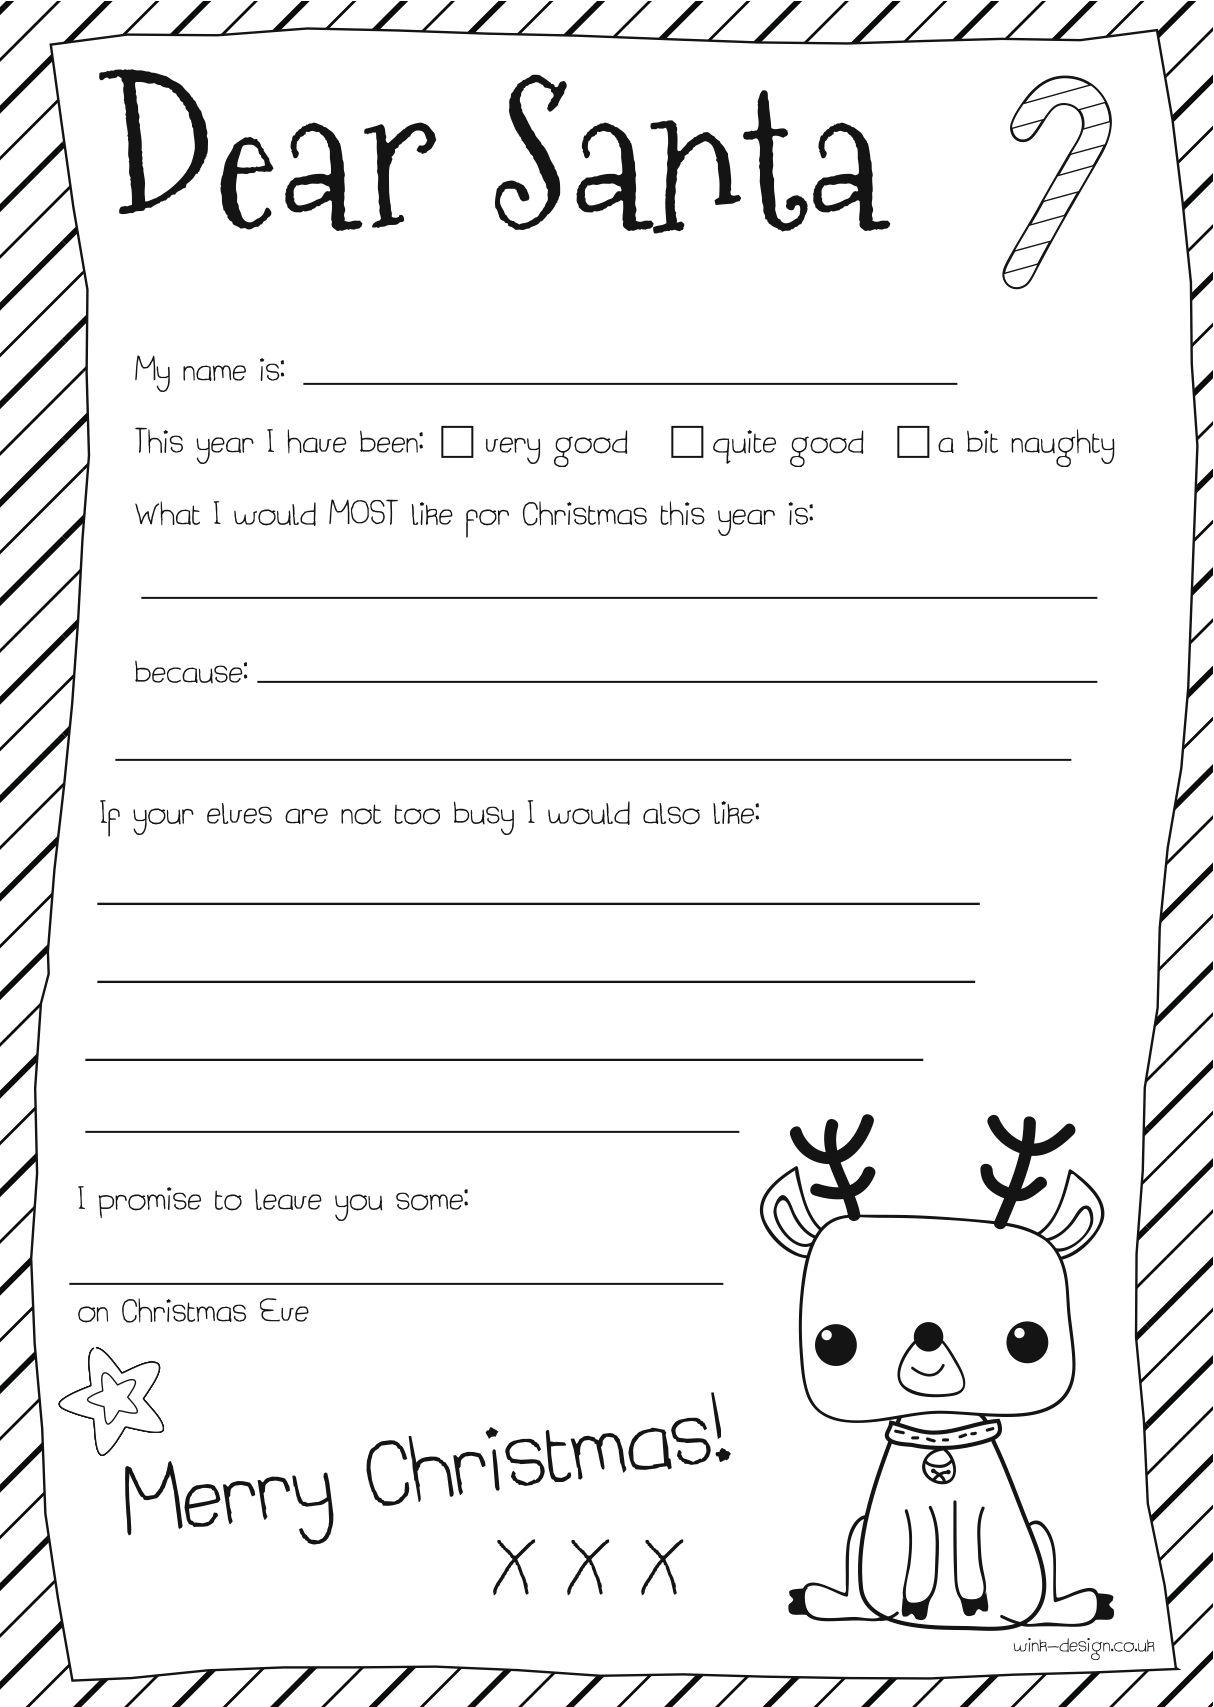 Dear Santa Letter